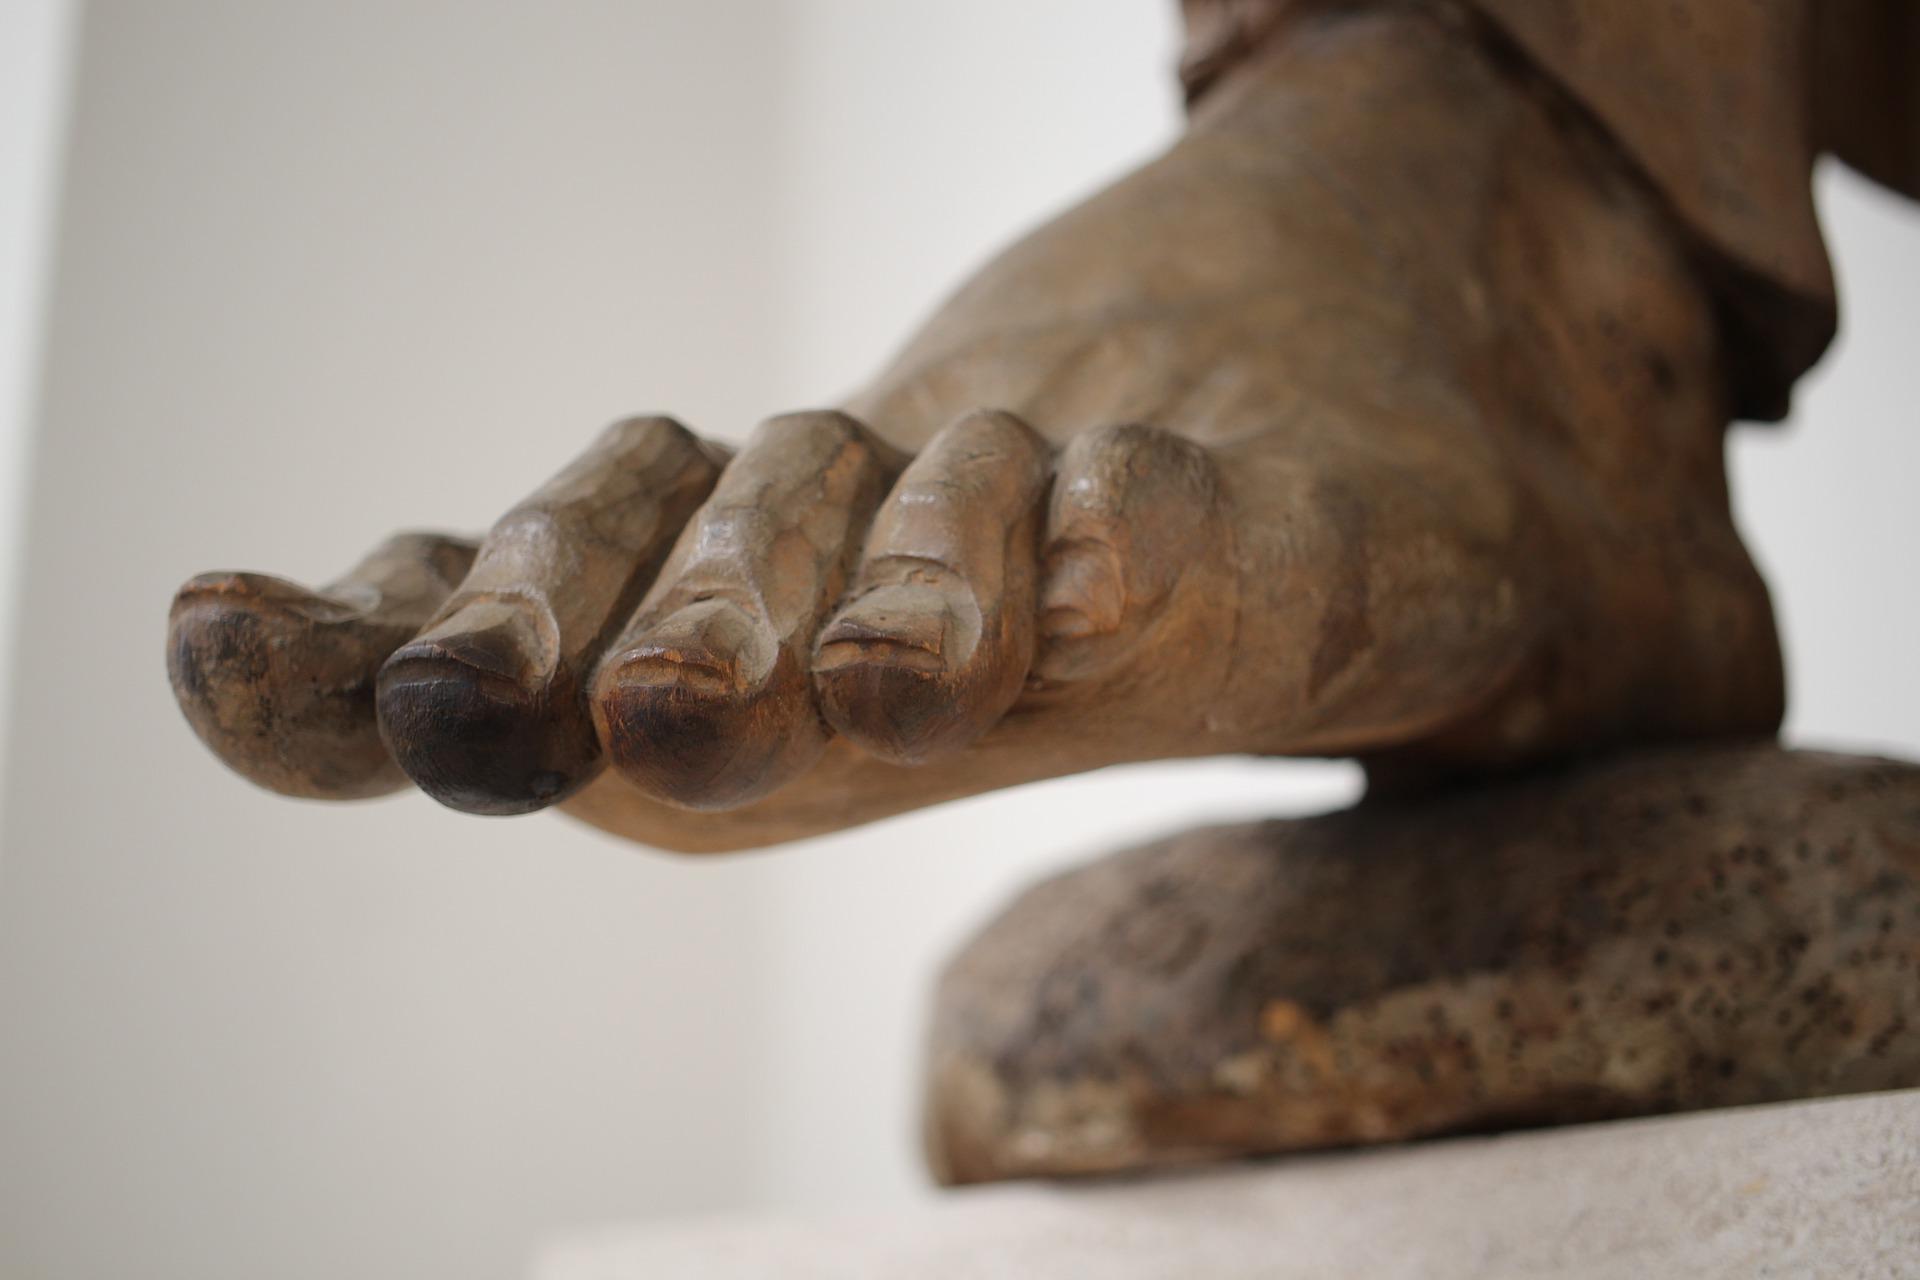 sculpture-3073624_1920